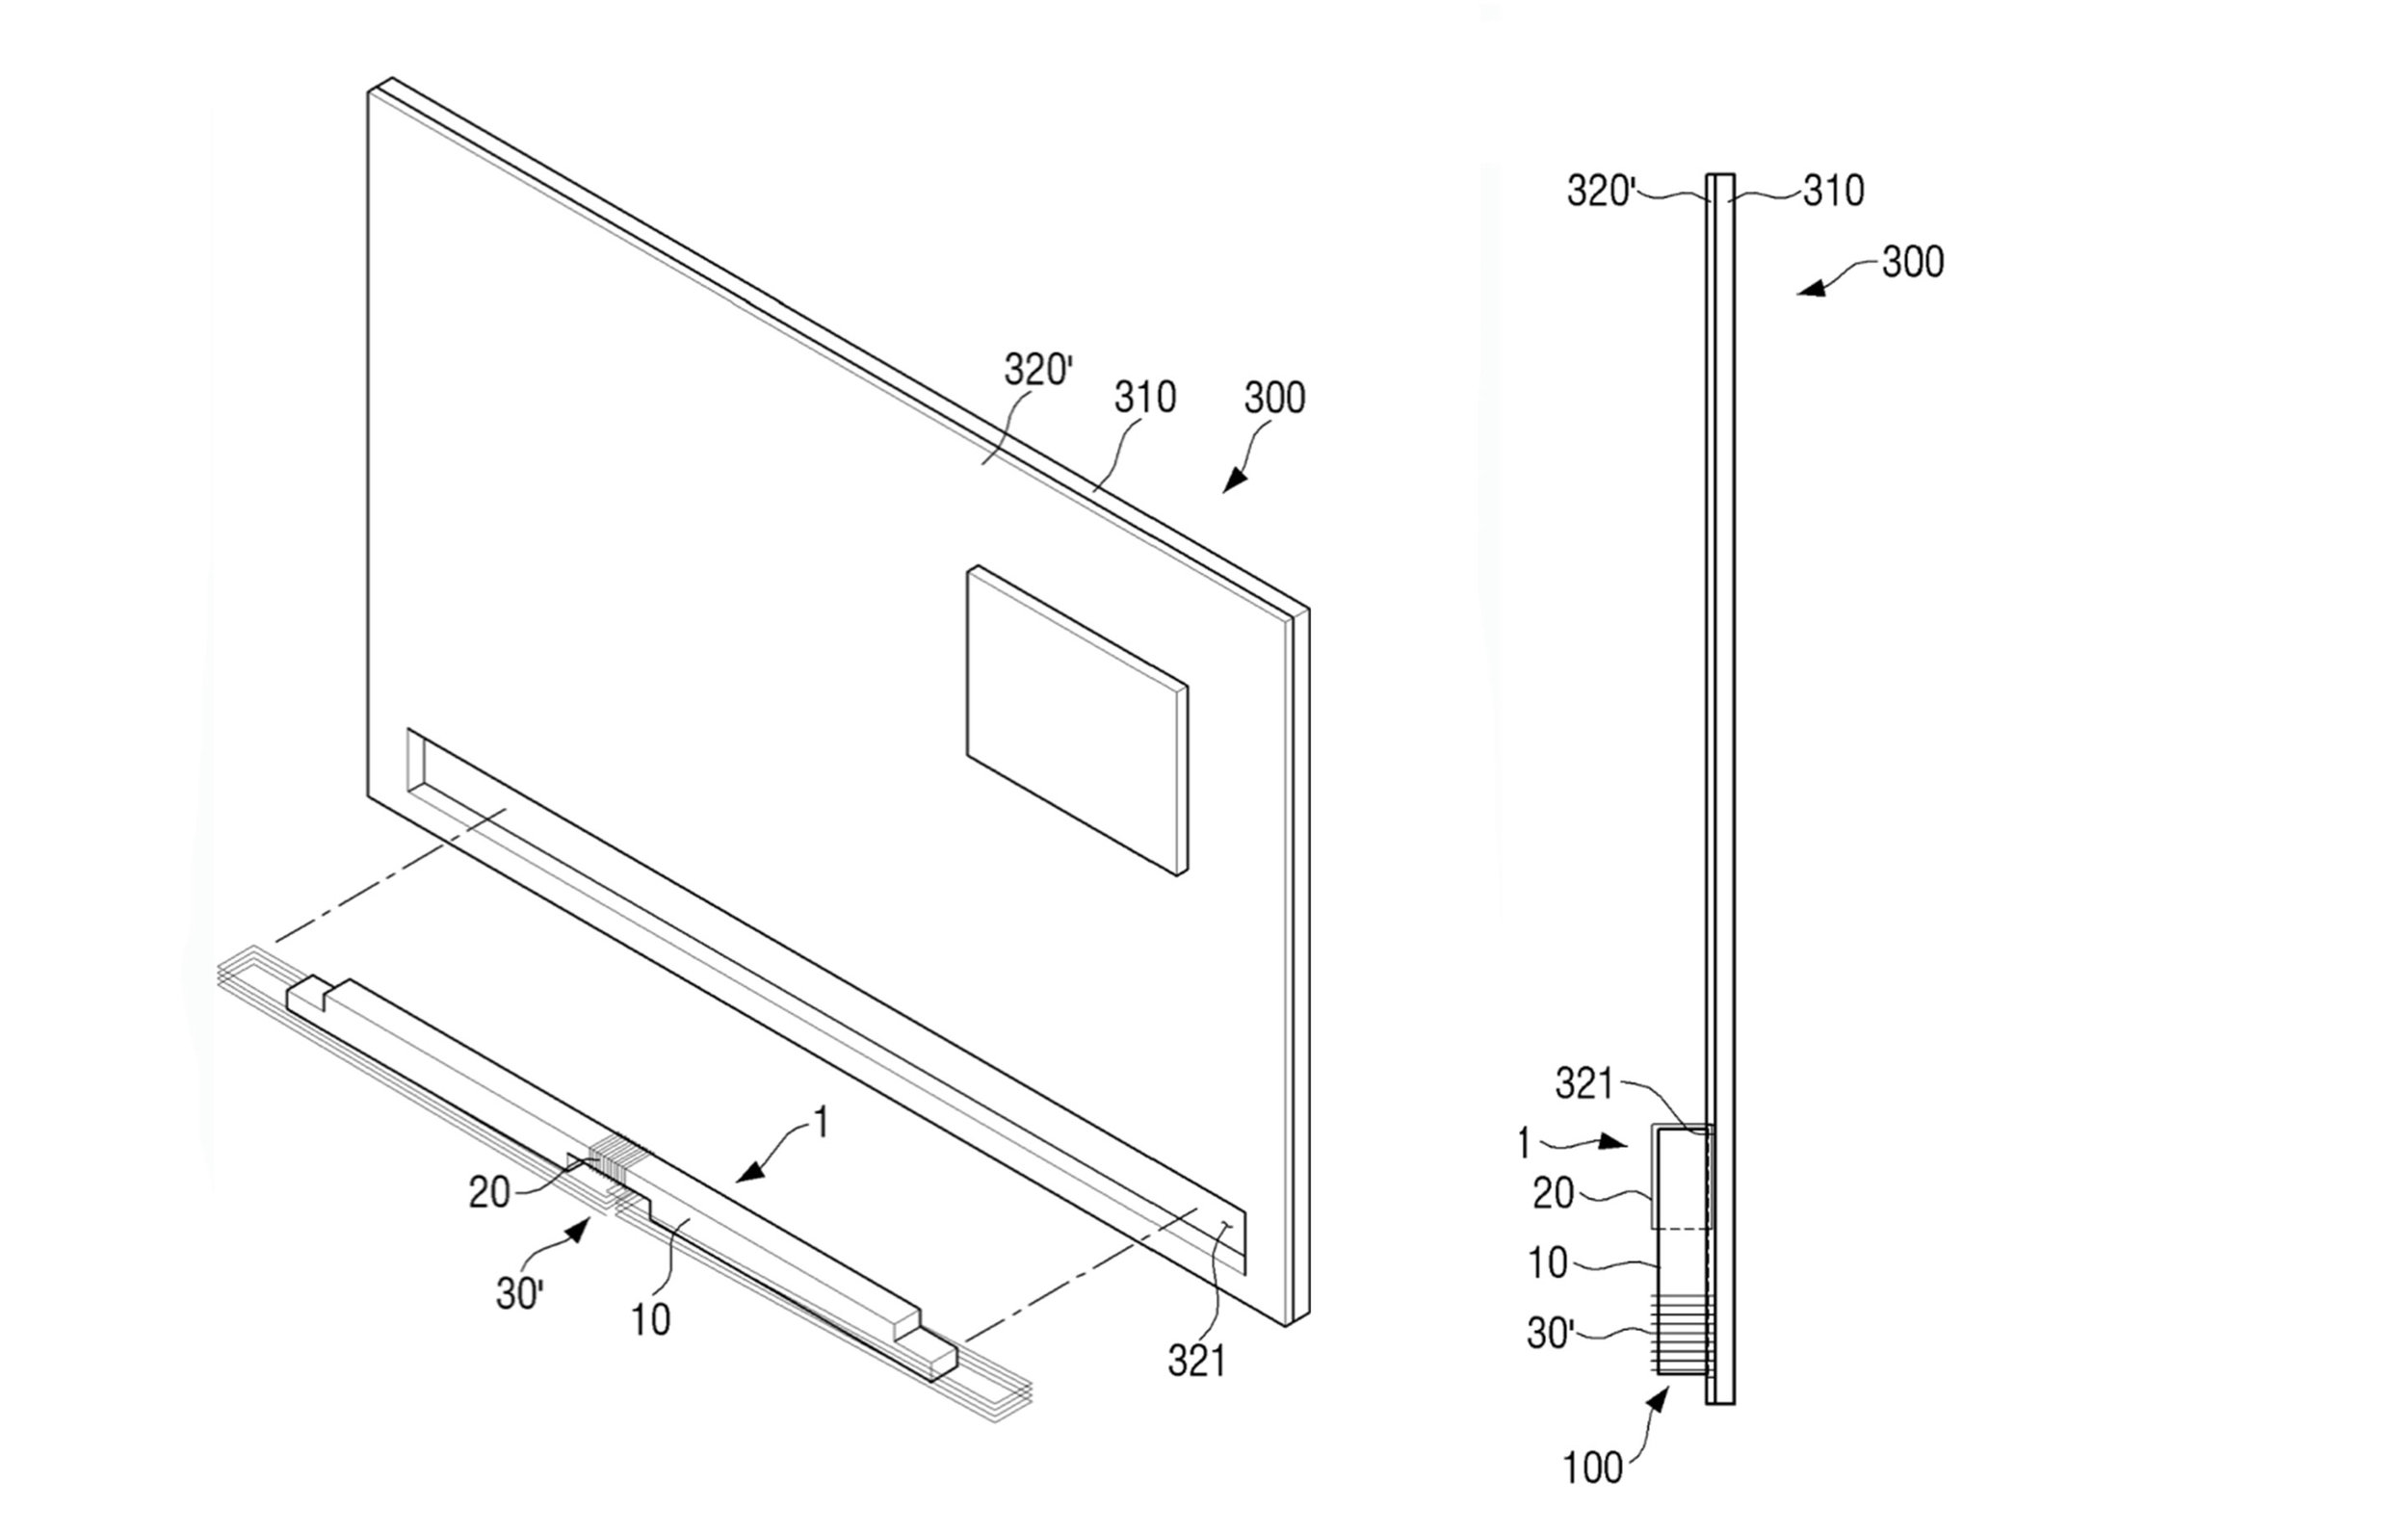 Samsung-patent-1.jpg